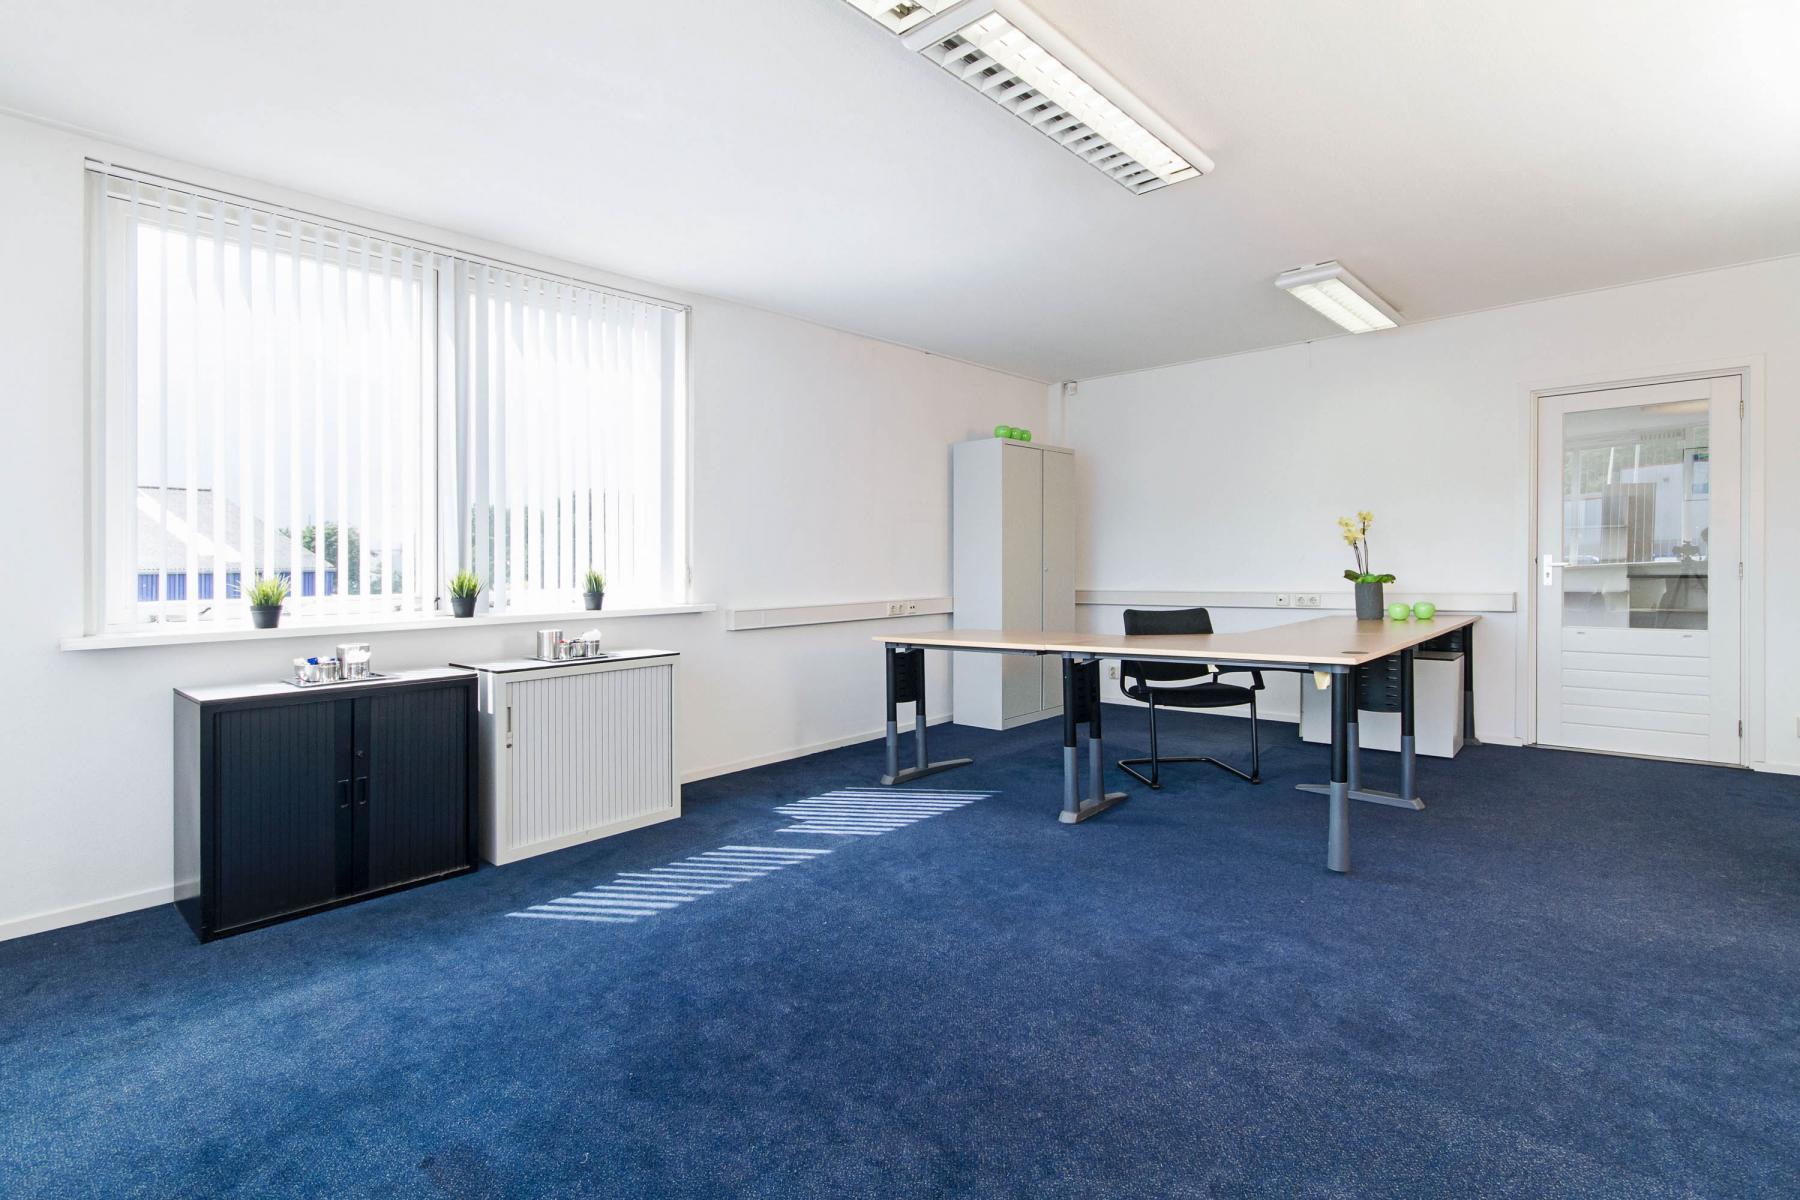 kantoorruimte binnenzijde werkplek overzicht